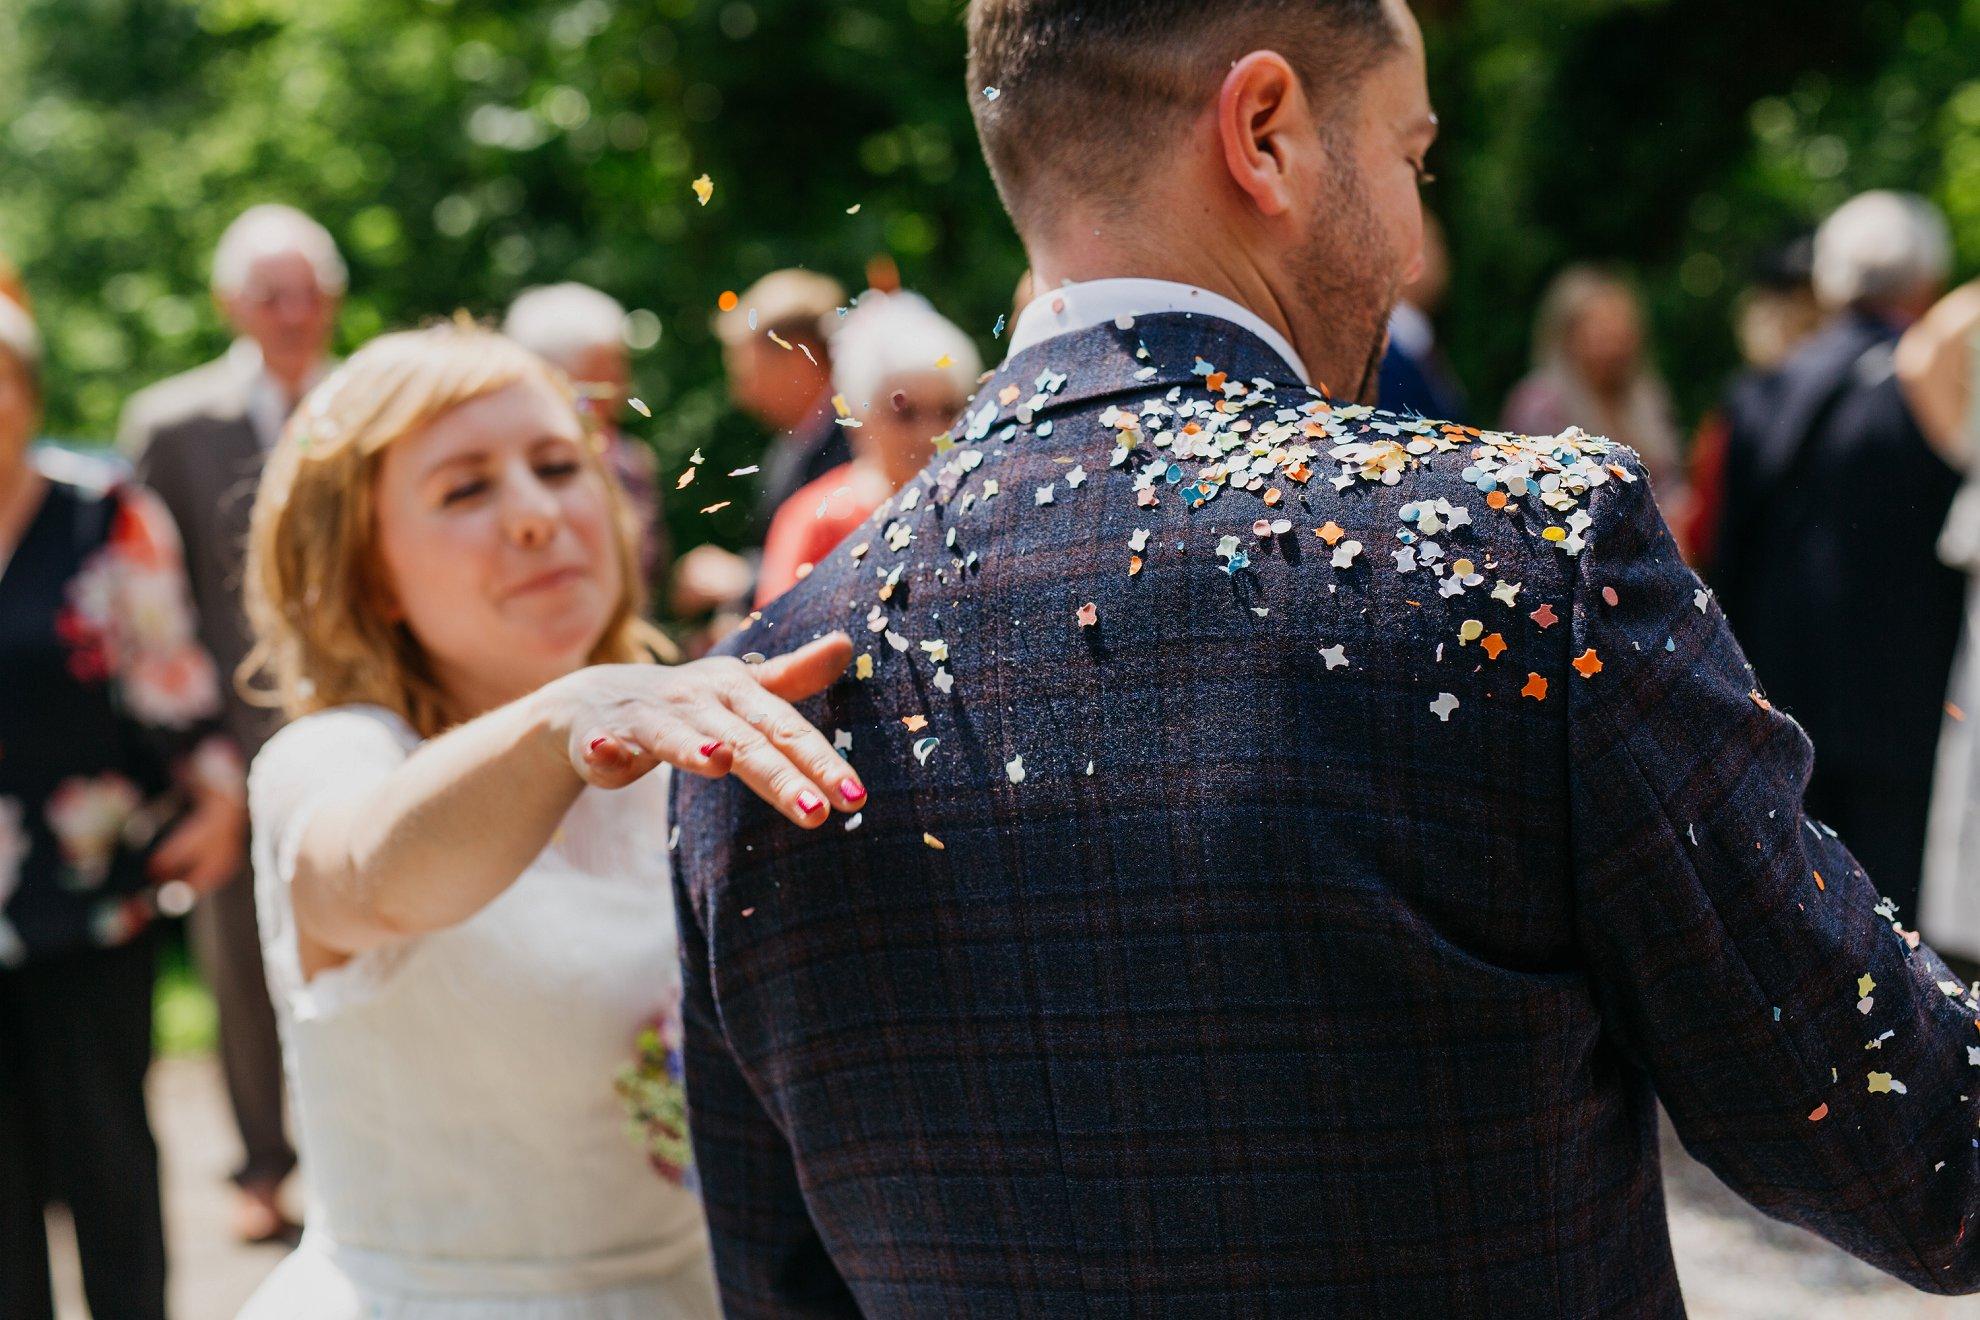 north lincolcnhsire wedding photographer